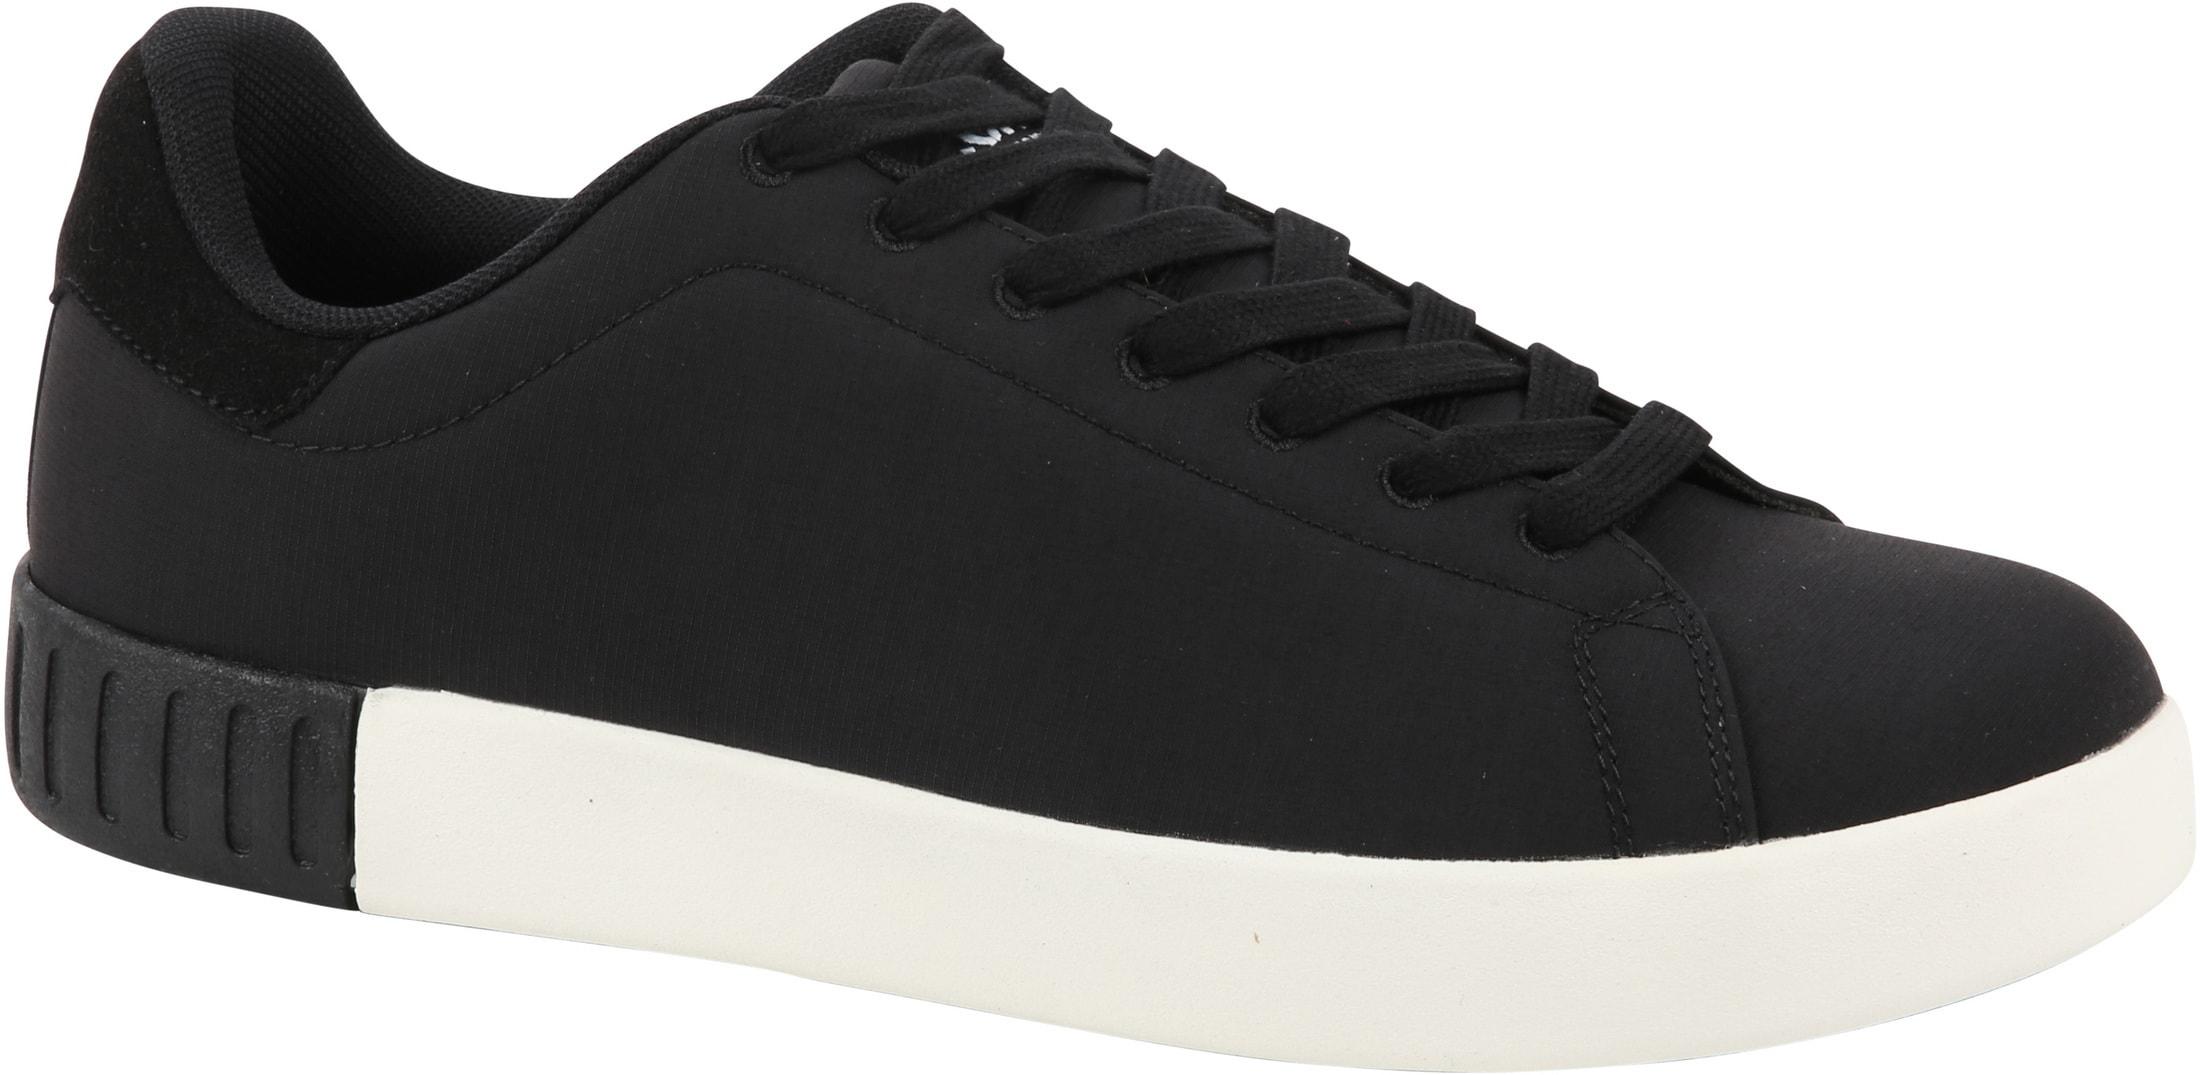 Ecoalf Sneaker Austin Black